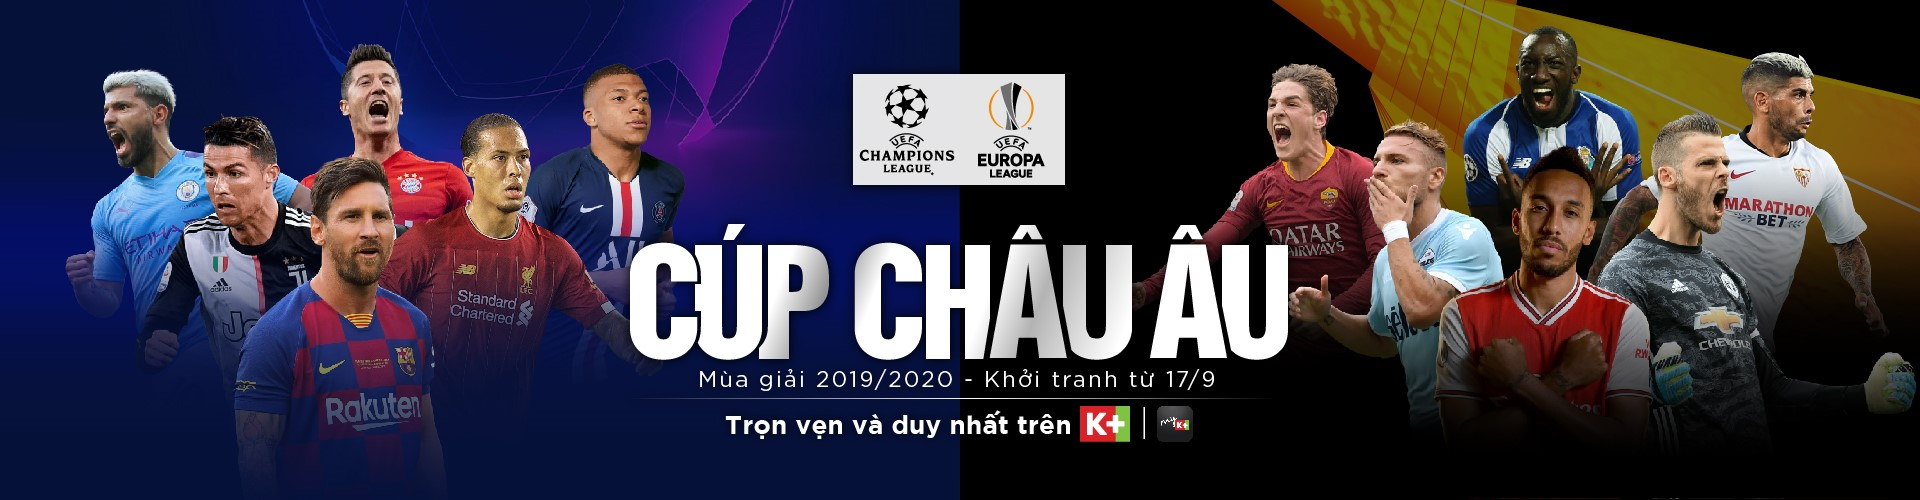 Cúp châu âu trên K+ mùa giải 2019-2020